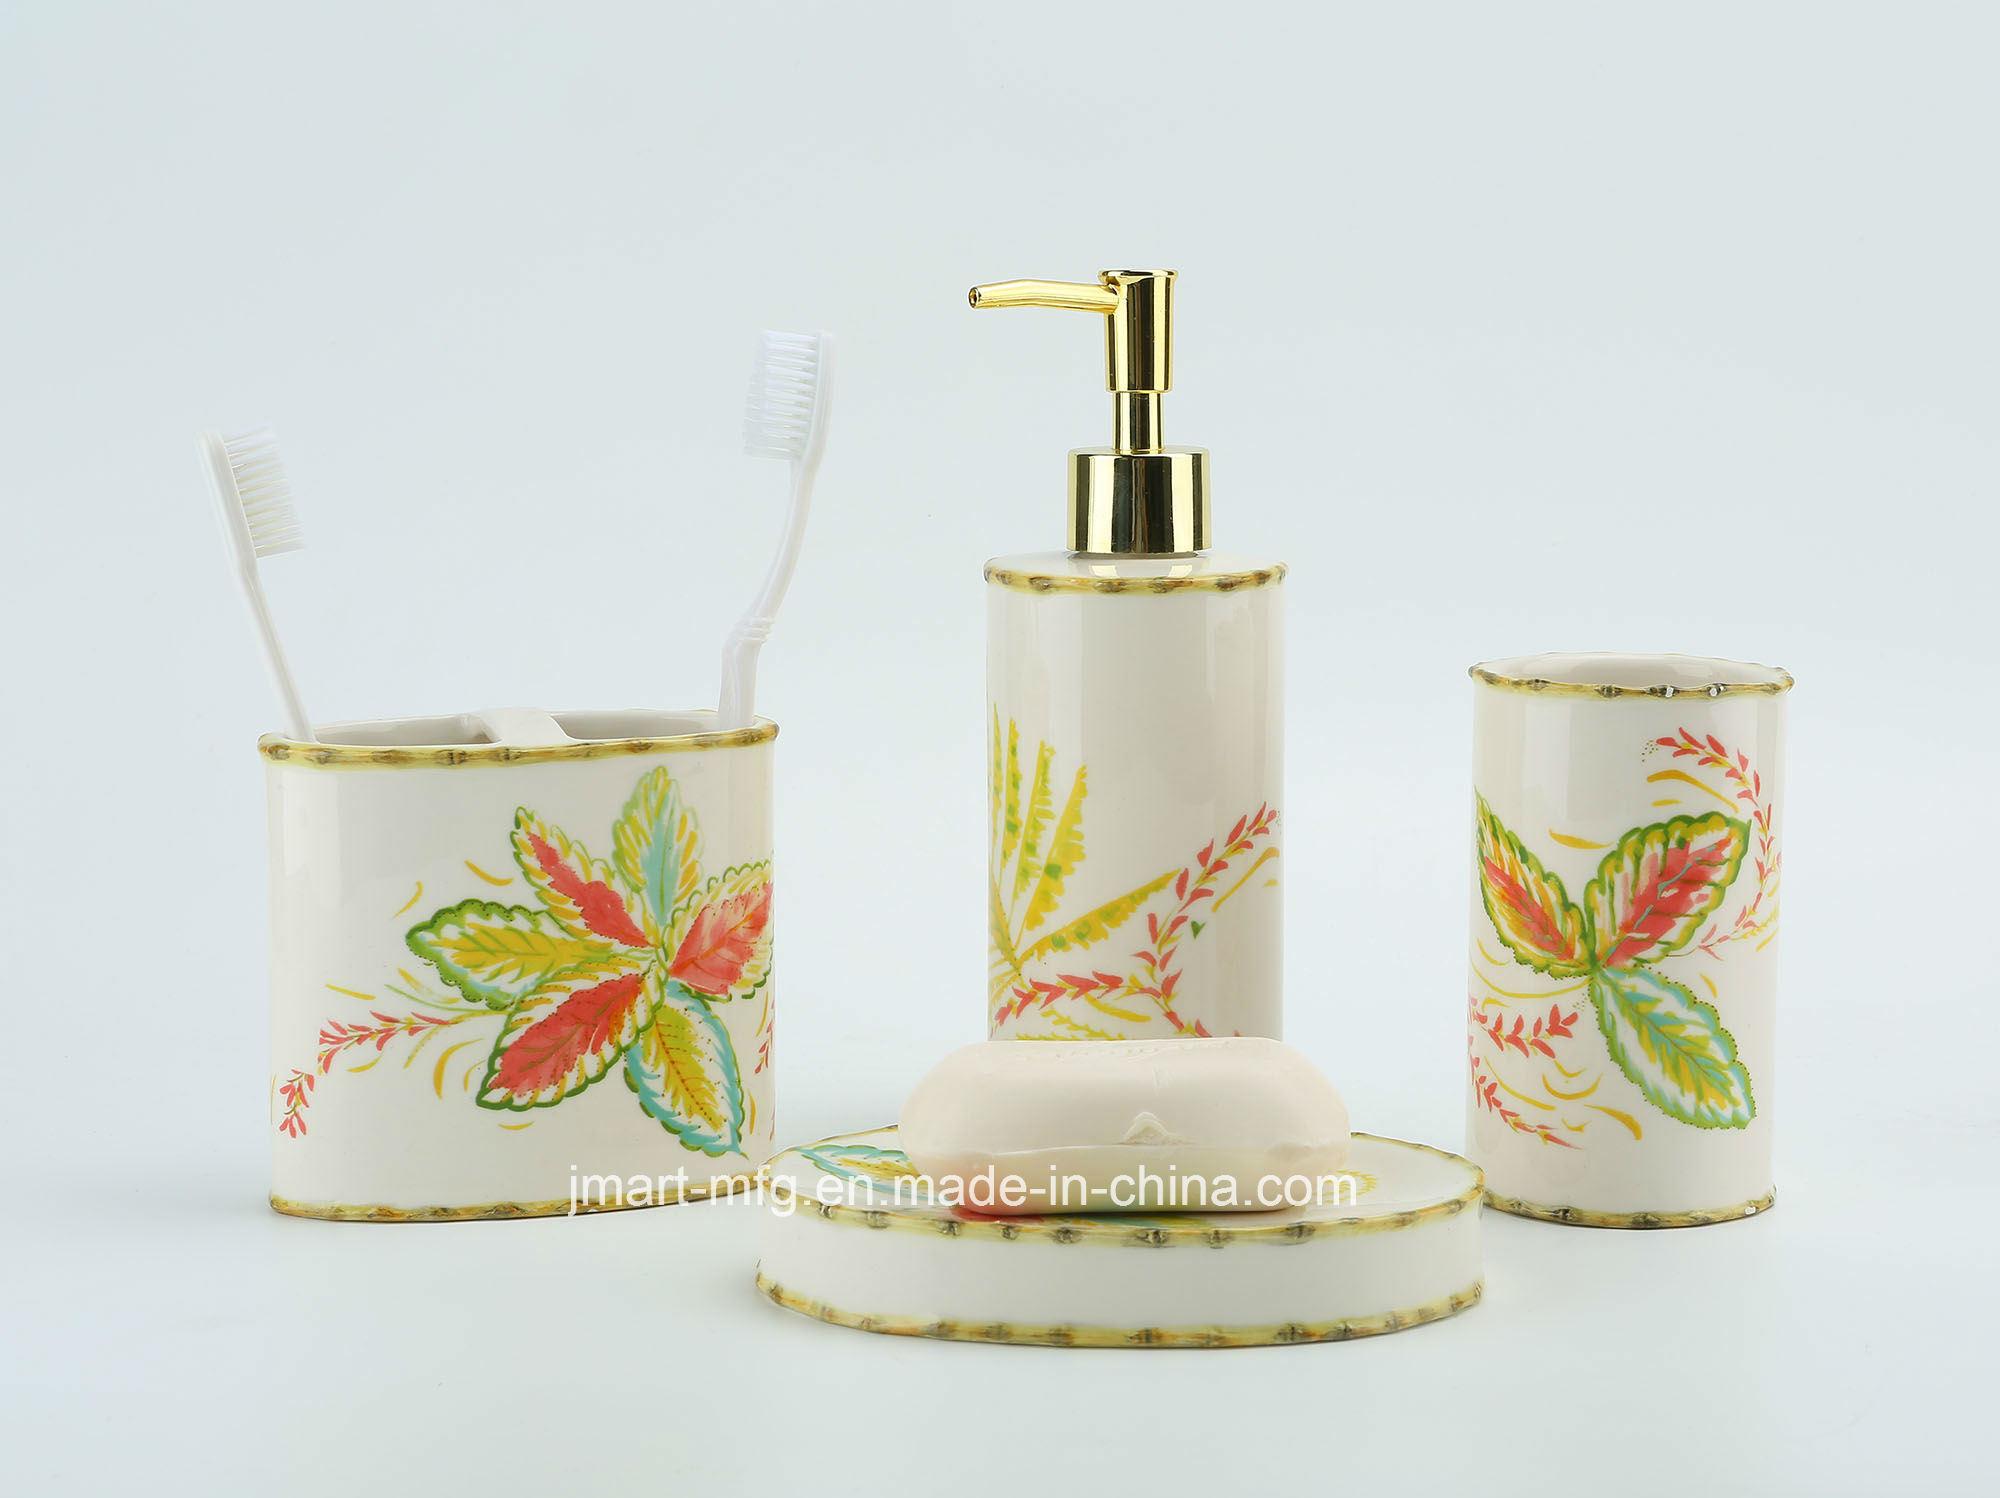 Tropical Palm Decal Hand Paint Ceramic Bathroom Accessory